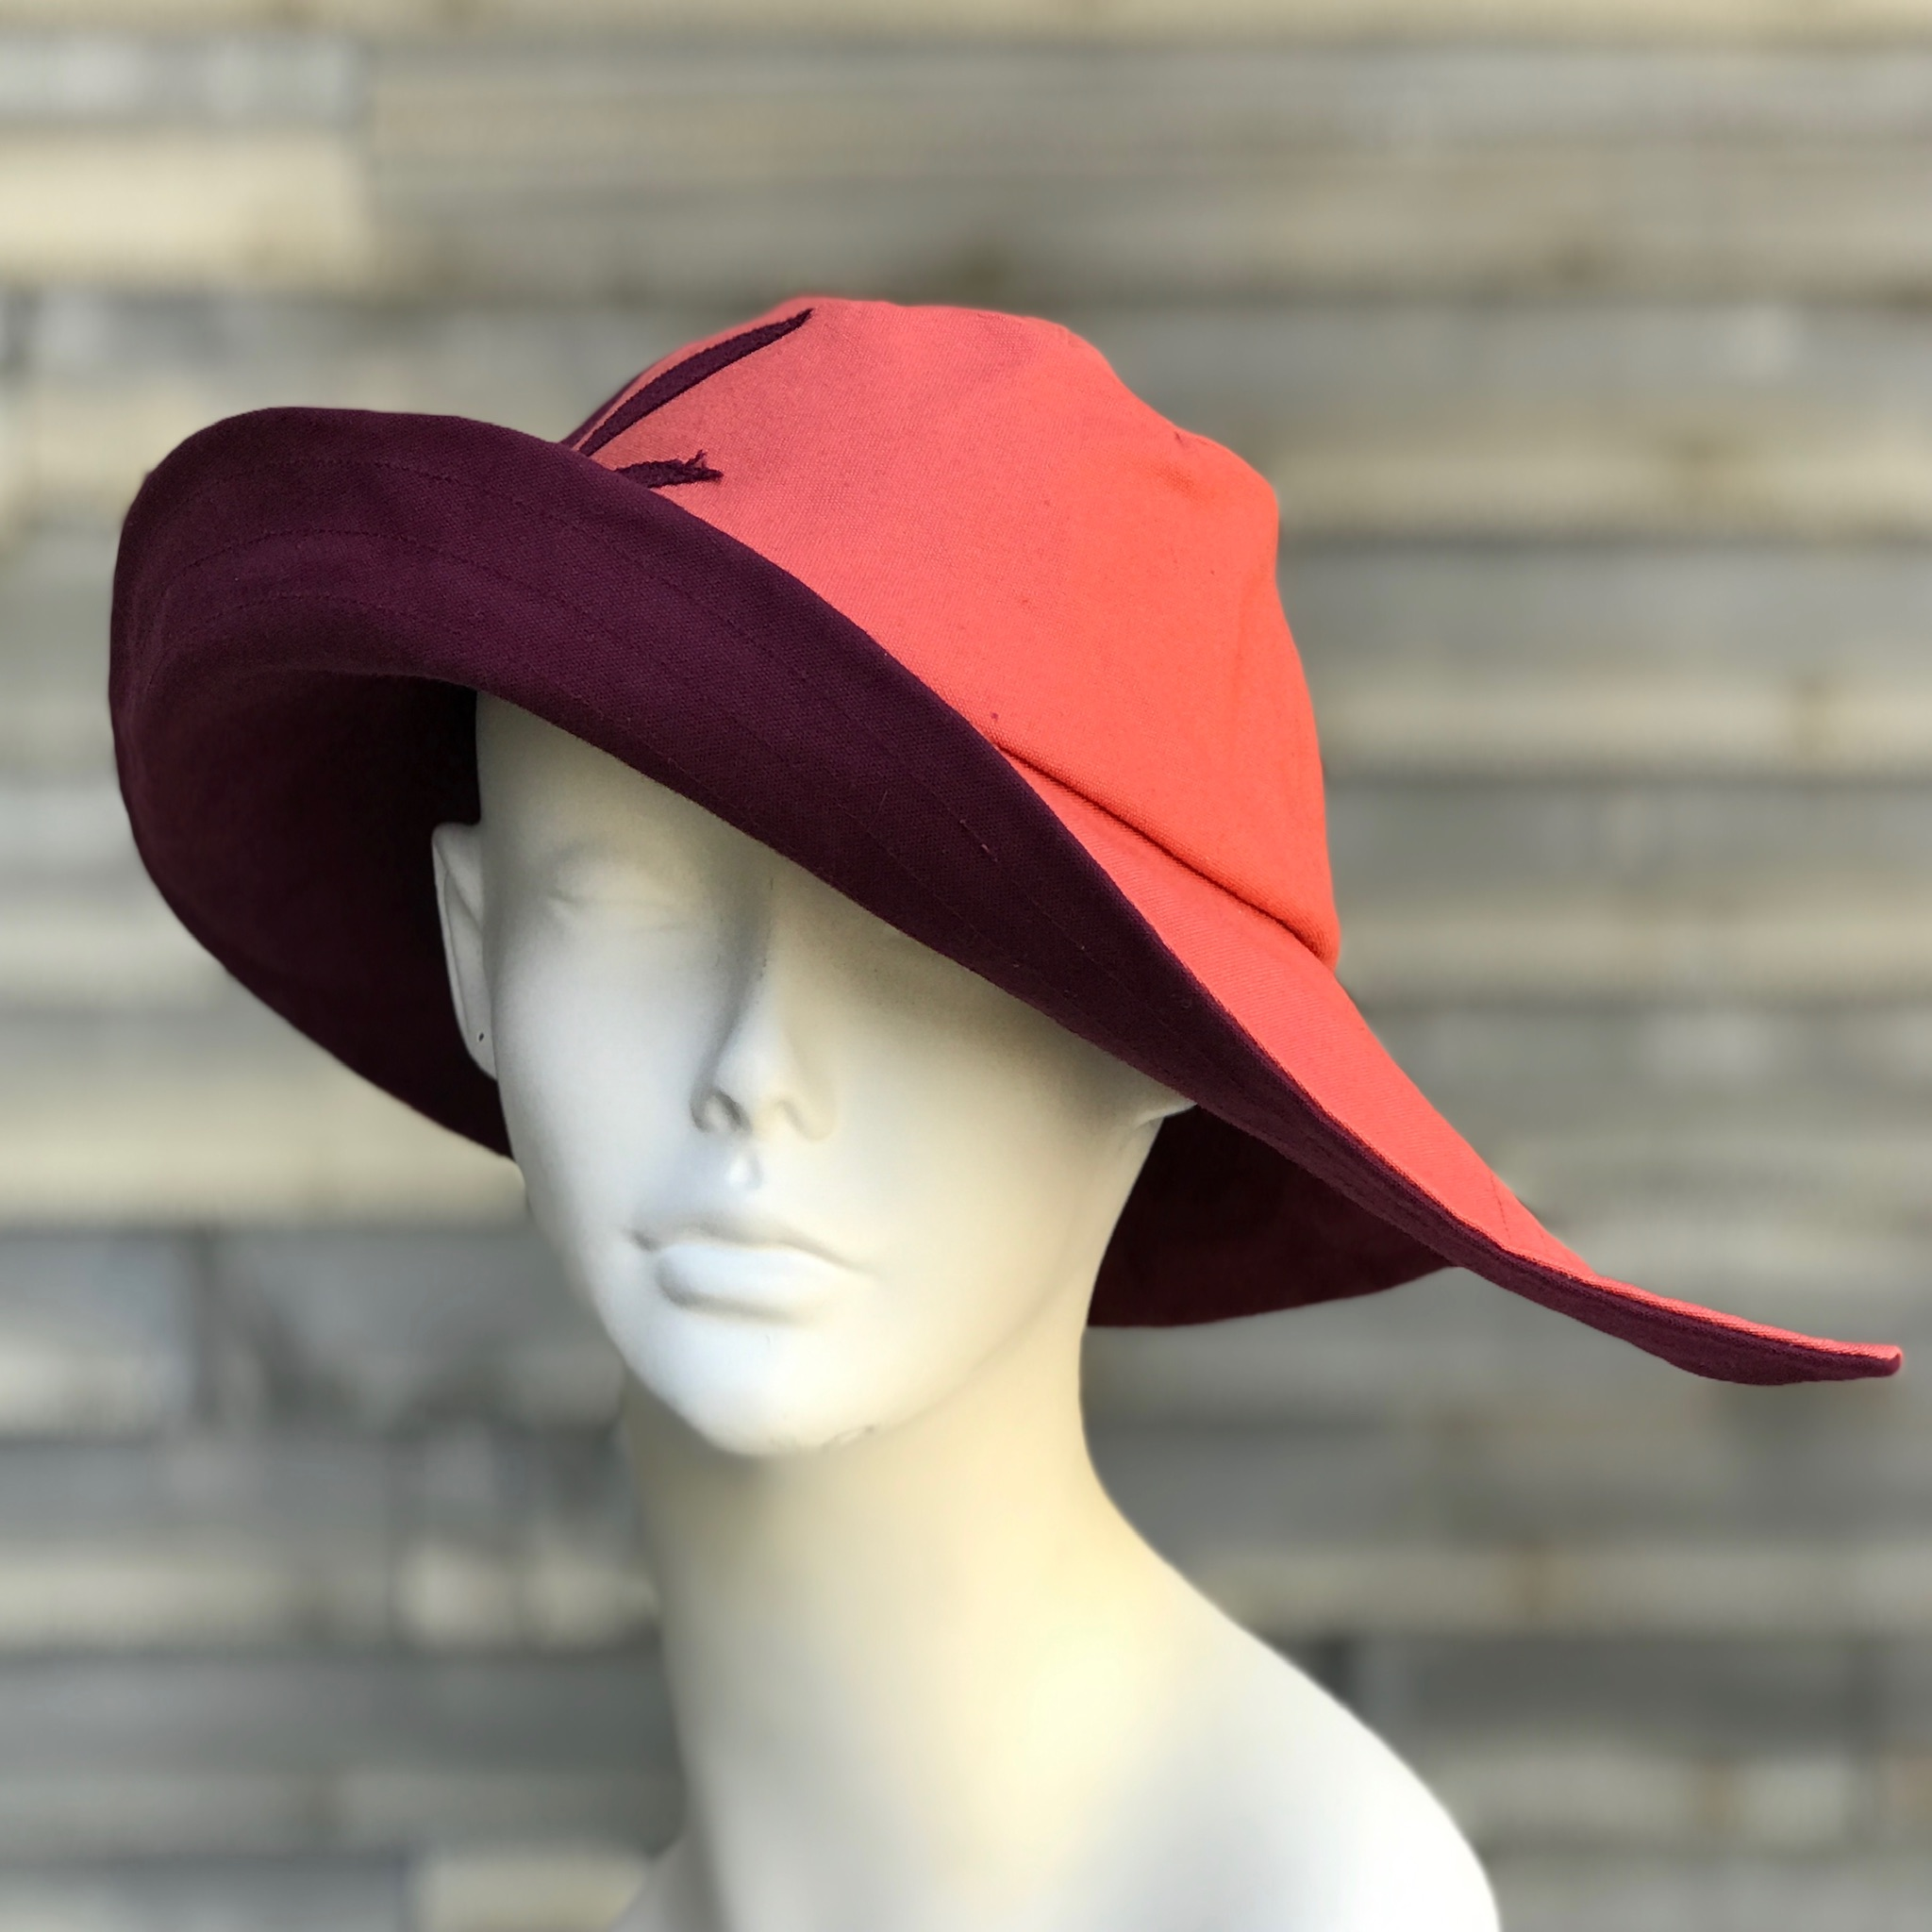 Soigne rain hat sun hat